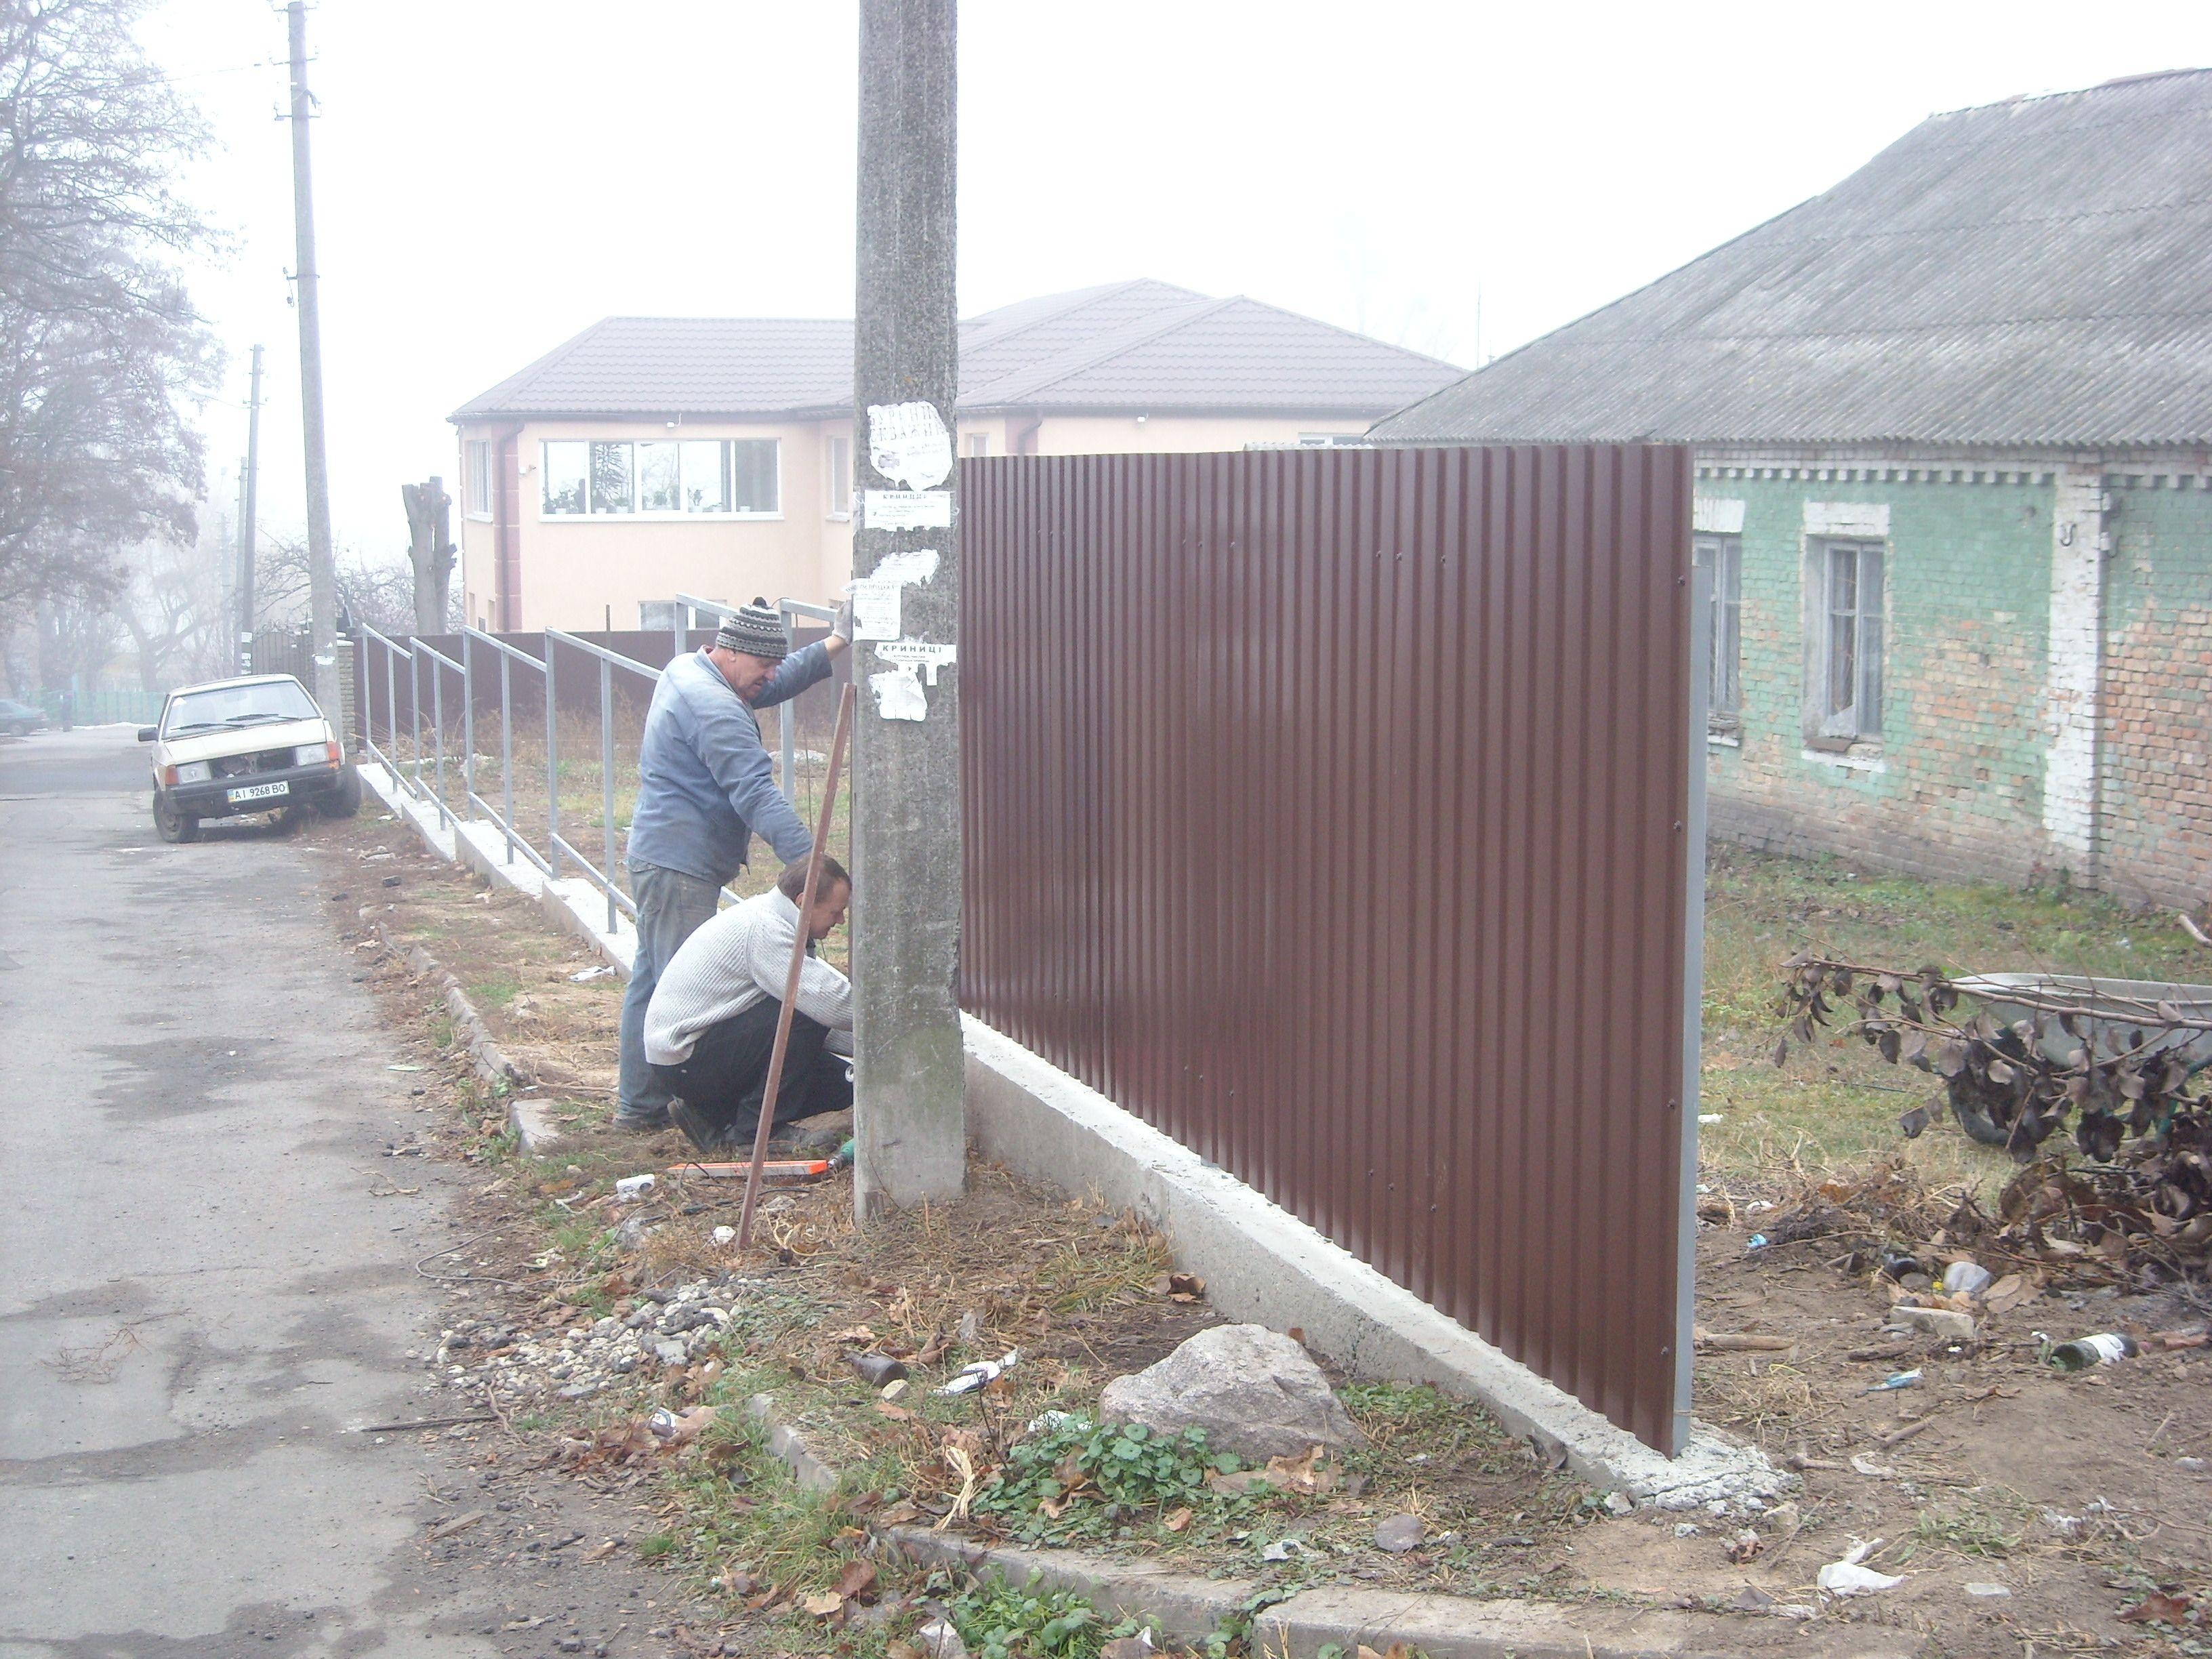 Corrugated Metal Fence Cost Www Pixshark Com Images